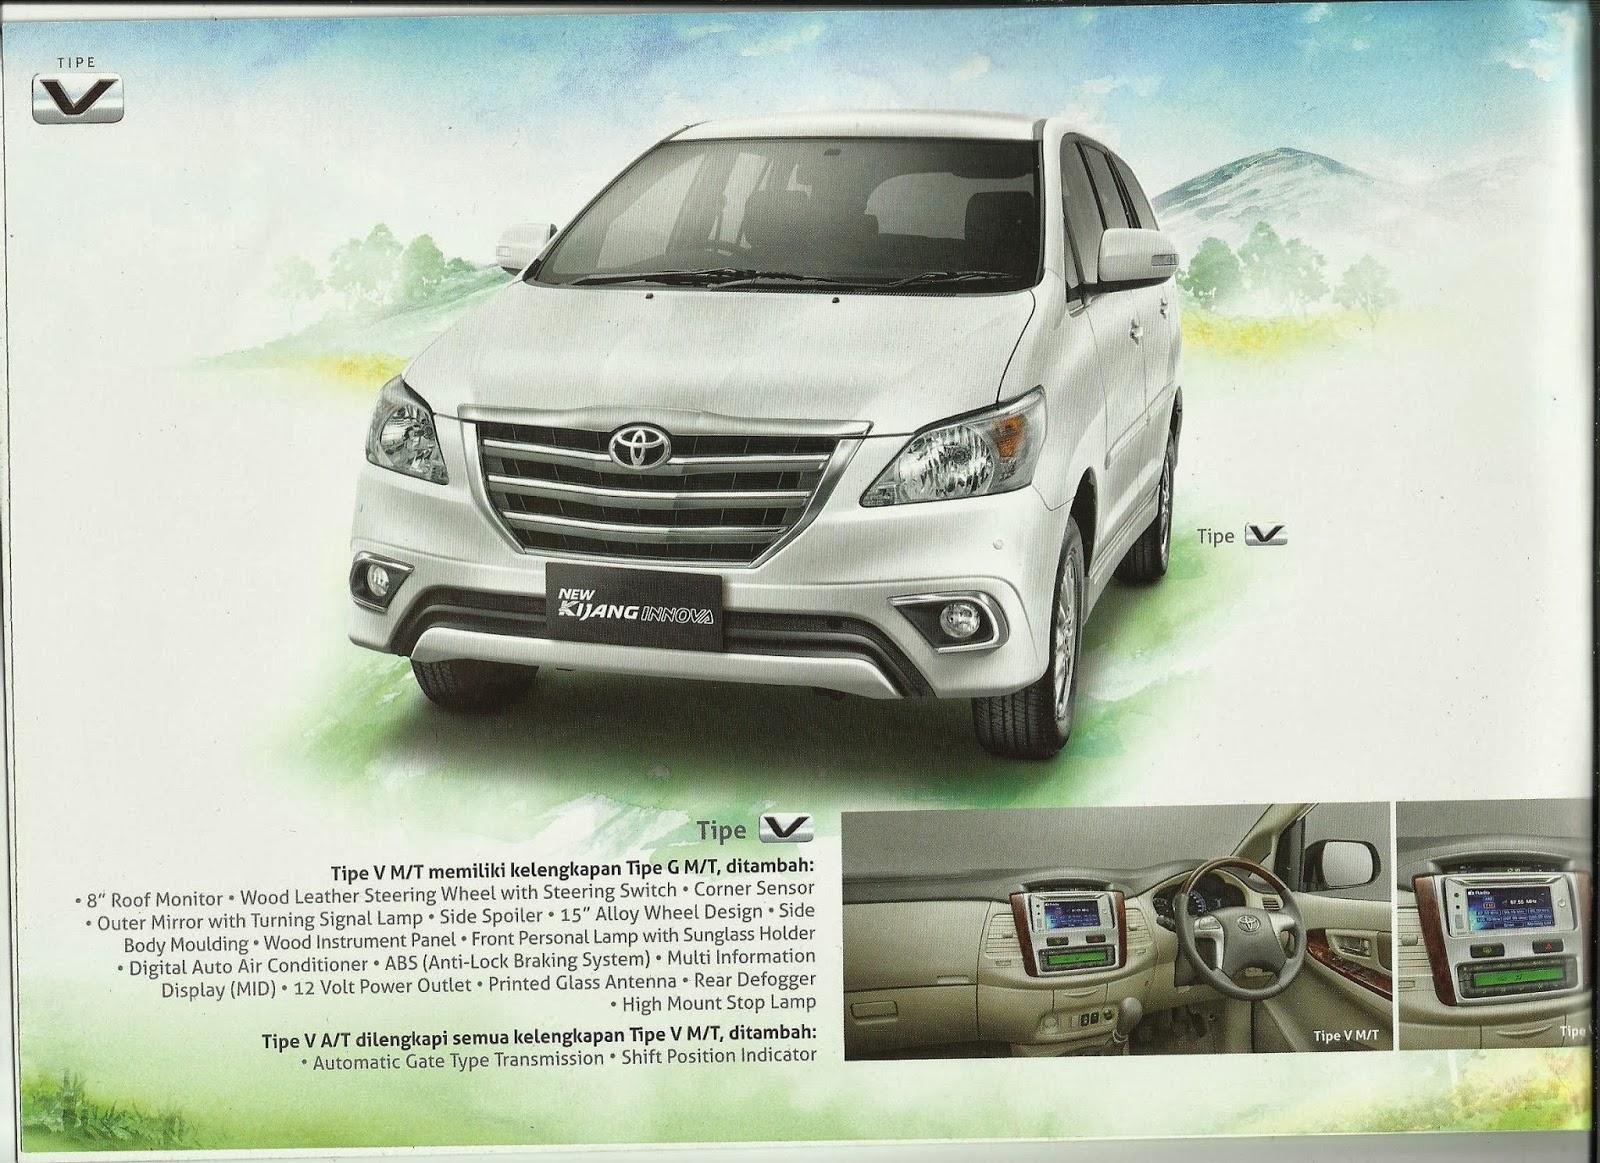 Suspensi All New Kijang Innova Jok Grand Avanza Auto2000 Karawang Brosur Dan Spesifikasi